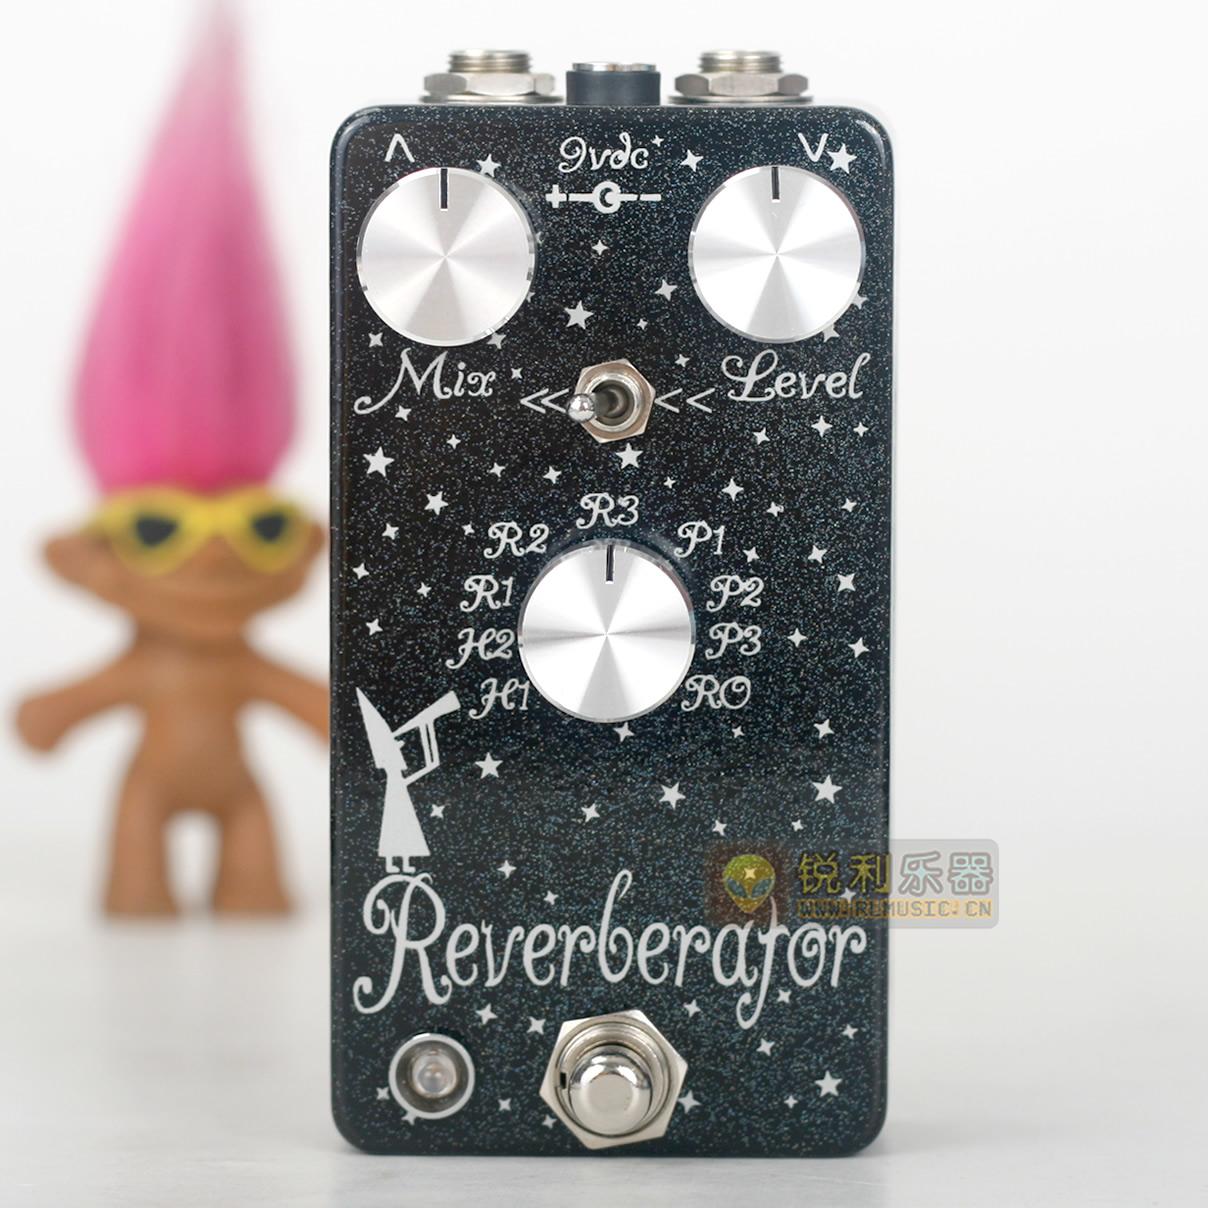 【Dr. Scientist Reverberator】9模式混响效果器【锐利乐器】